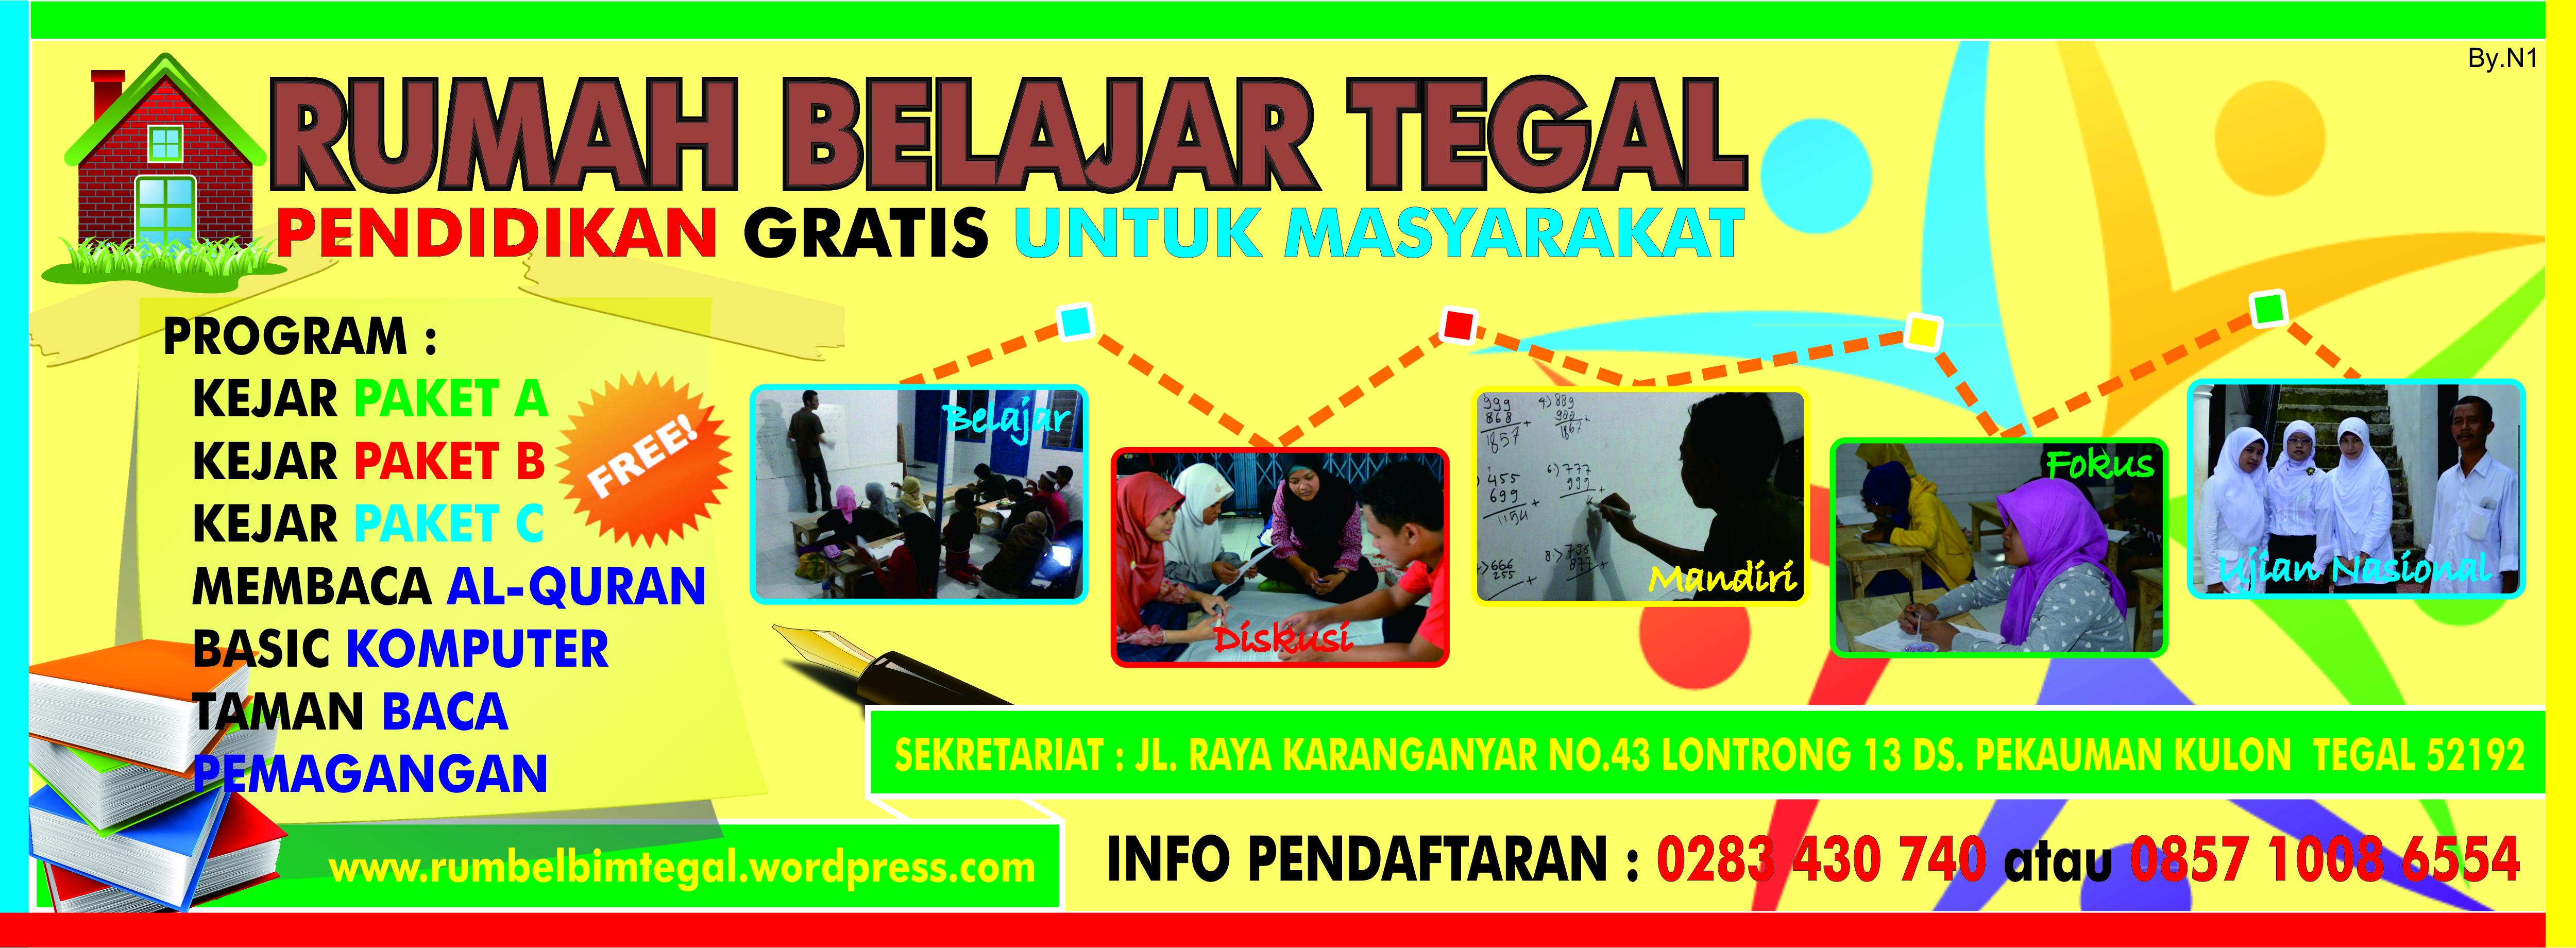 August 2014 R U M A H B E L A J A R Bim Tegal Jawa Tengah